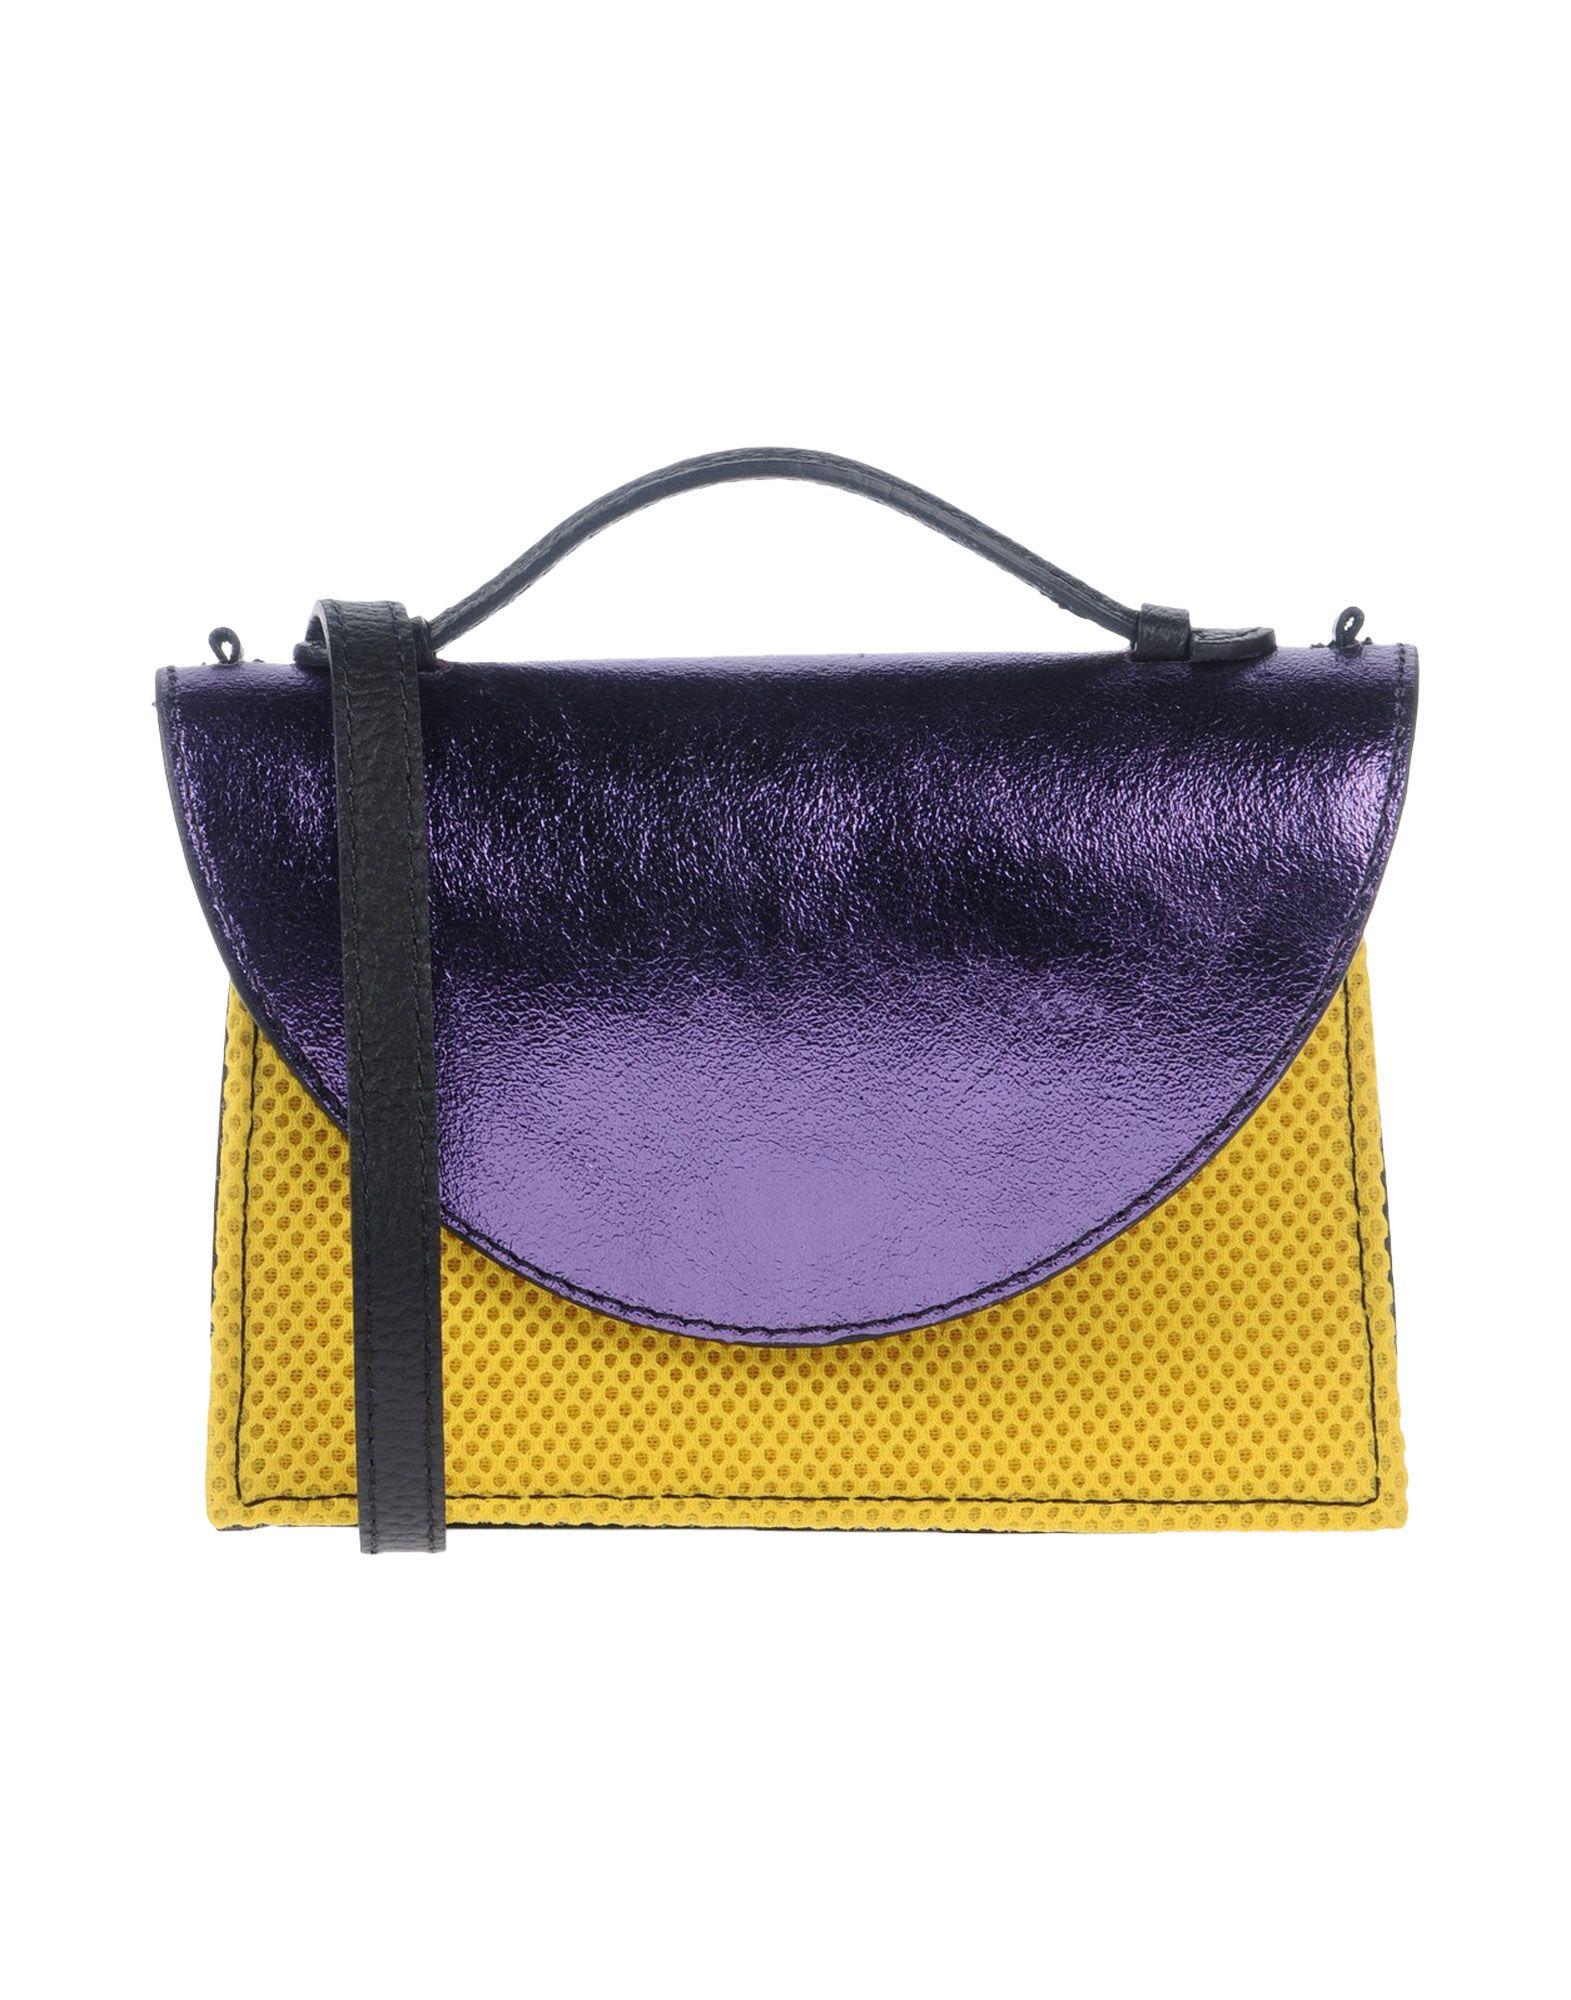 IMEMOI Handbag in Purple